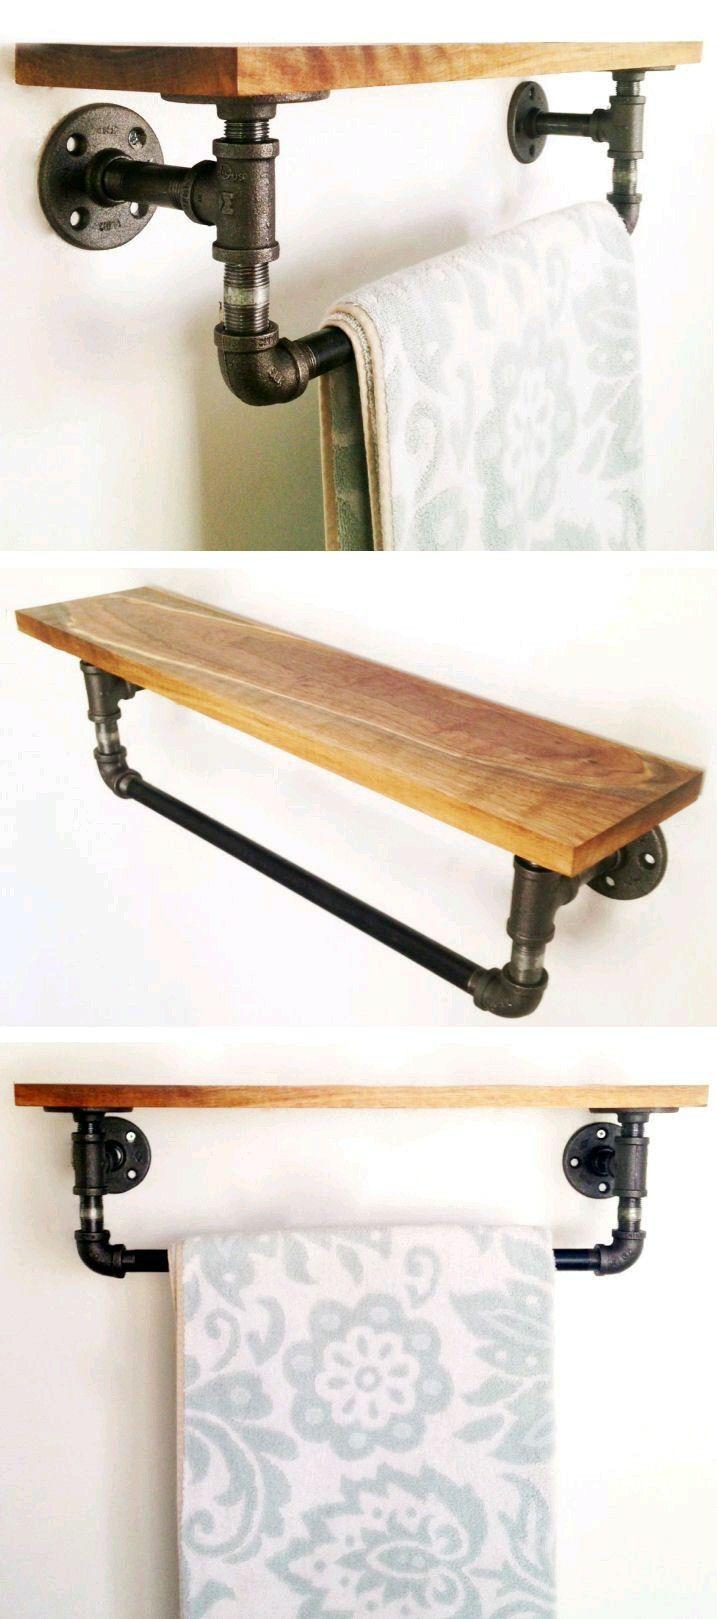 Repisa stand customwoodworkingottawa ideas para - Accesorios bano madera ...